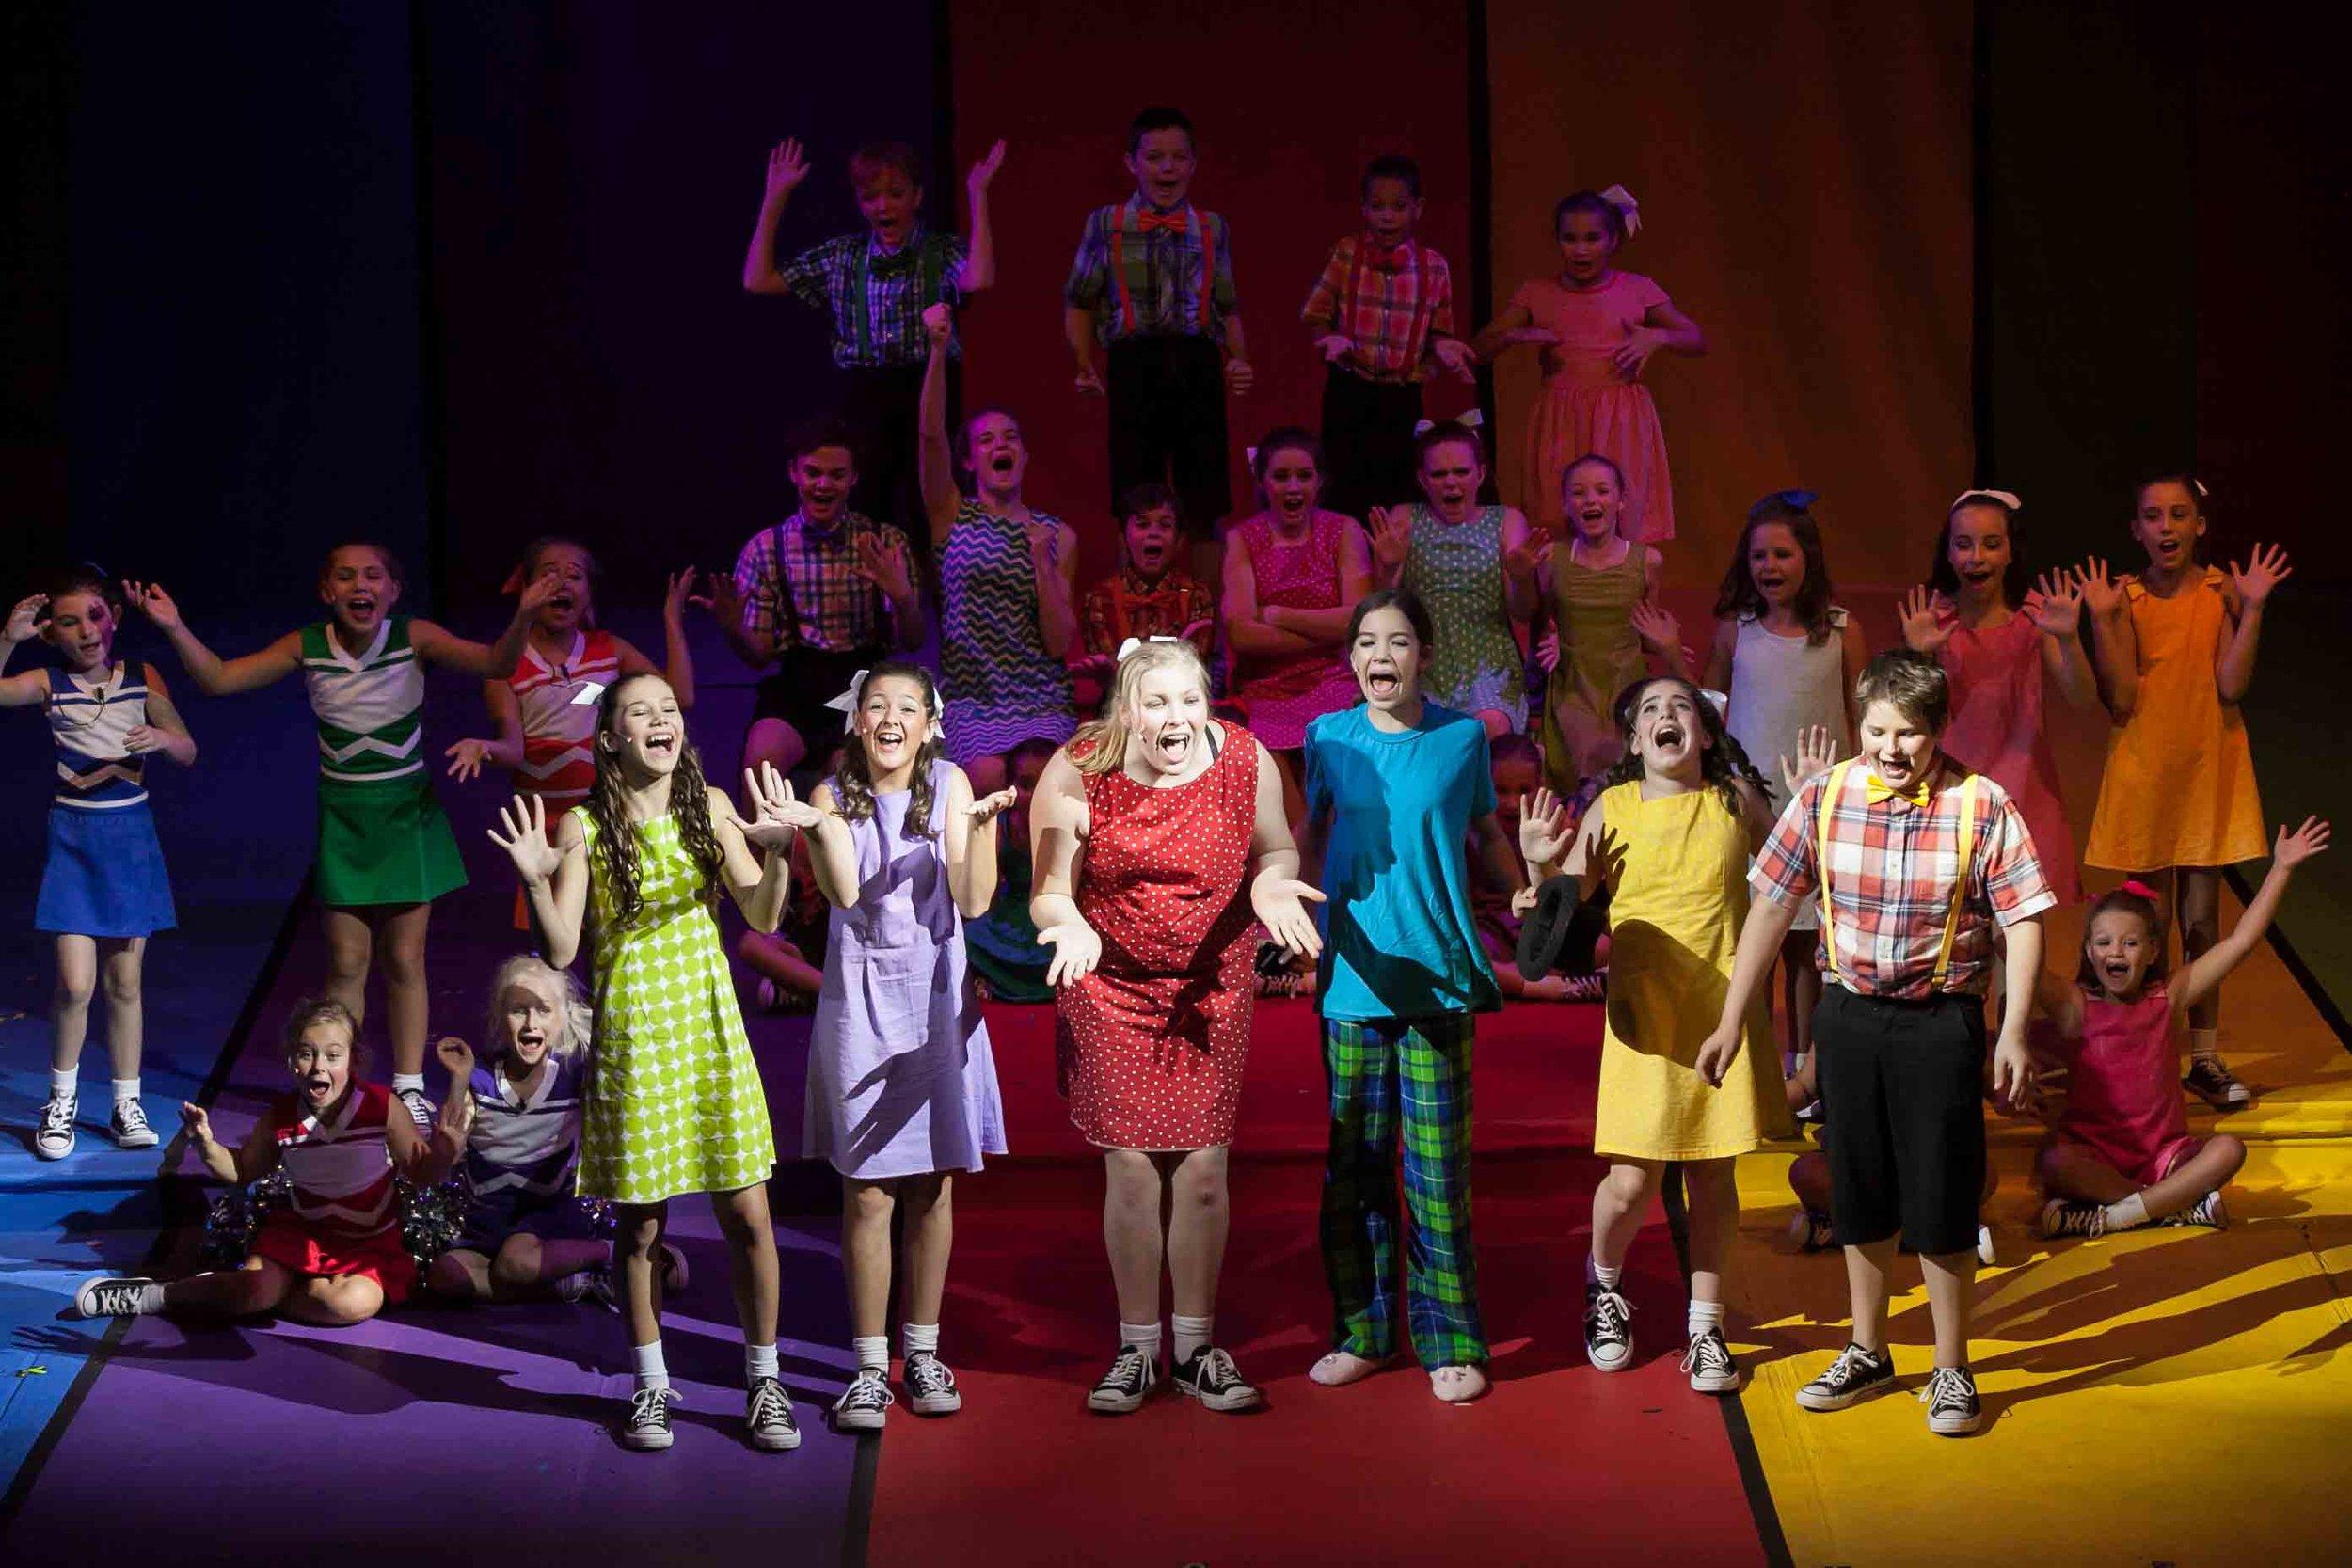 7-24-16 Whiz Kids Cast 0248.jpg